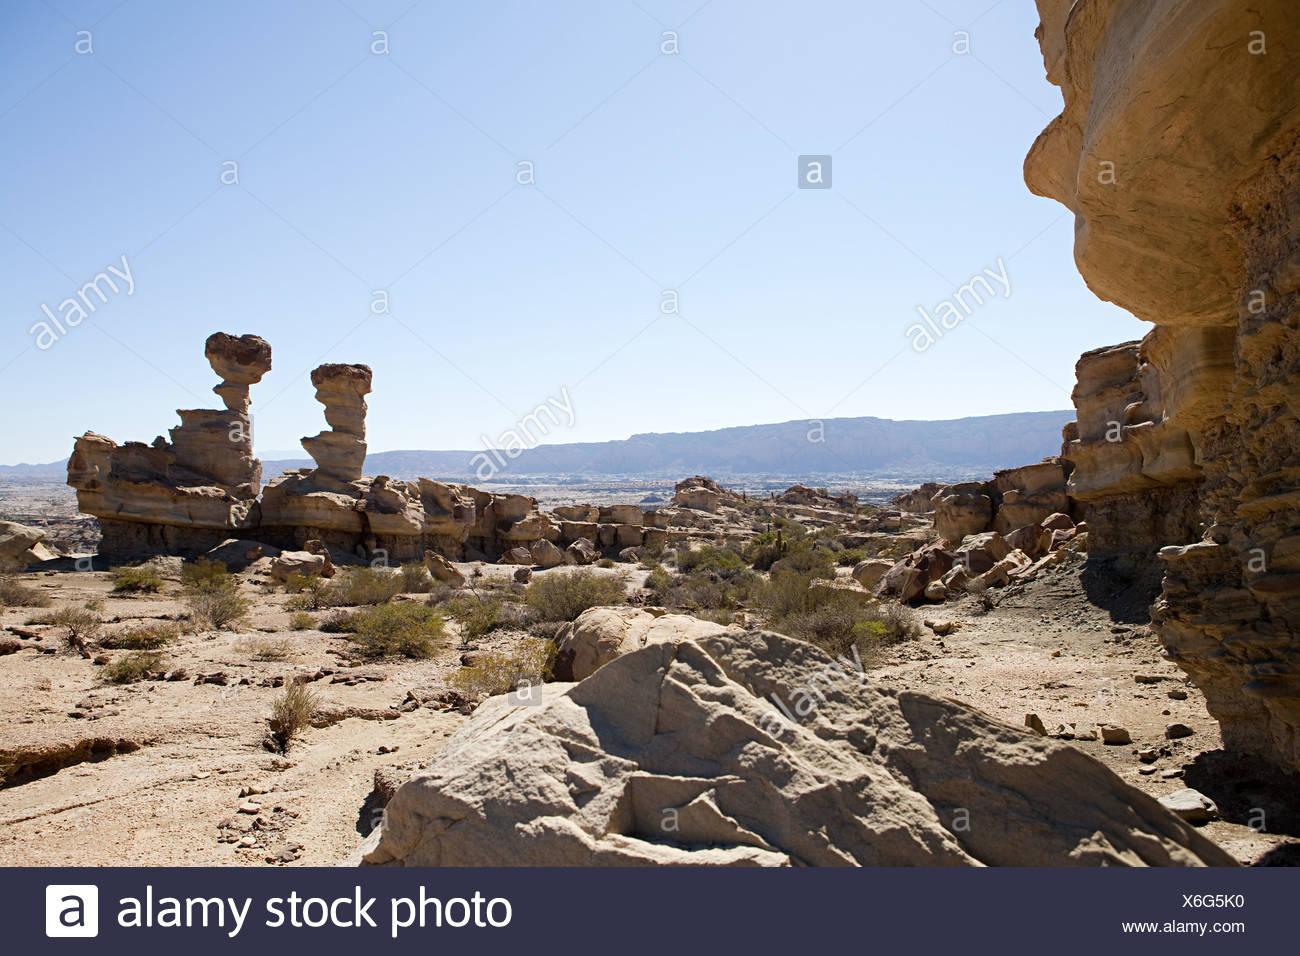 Rock formation in ischigualasto in san juan province of argentina - Stock Image